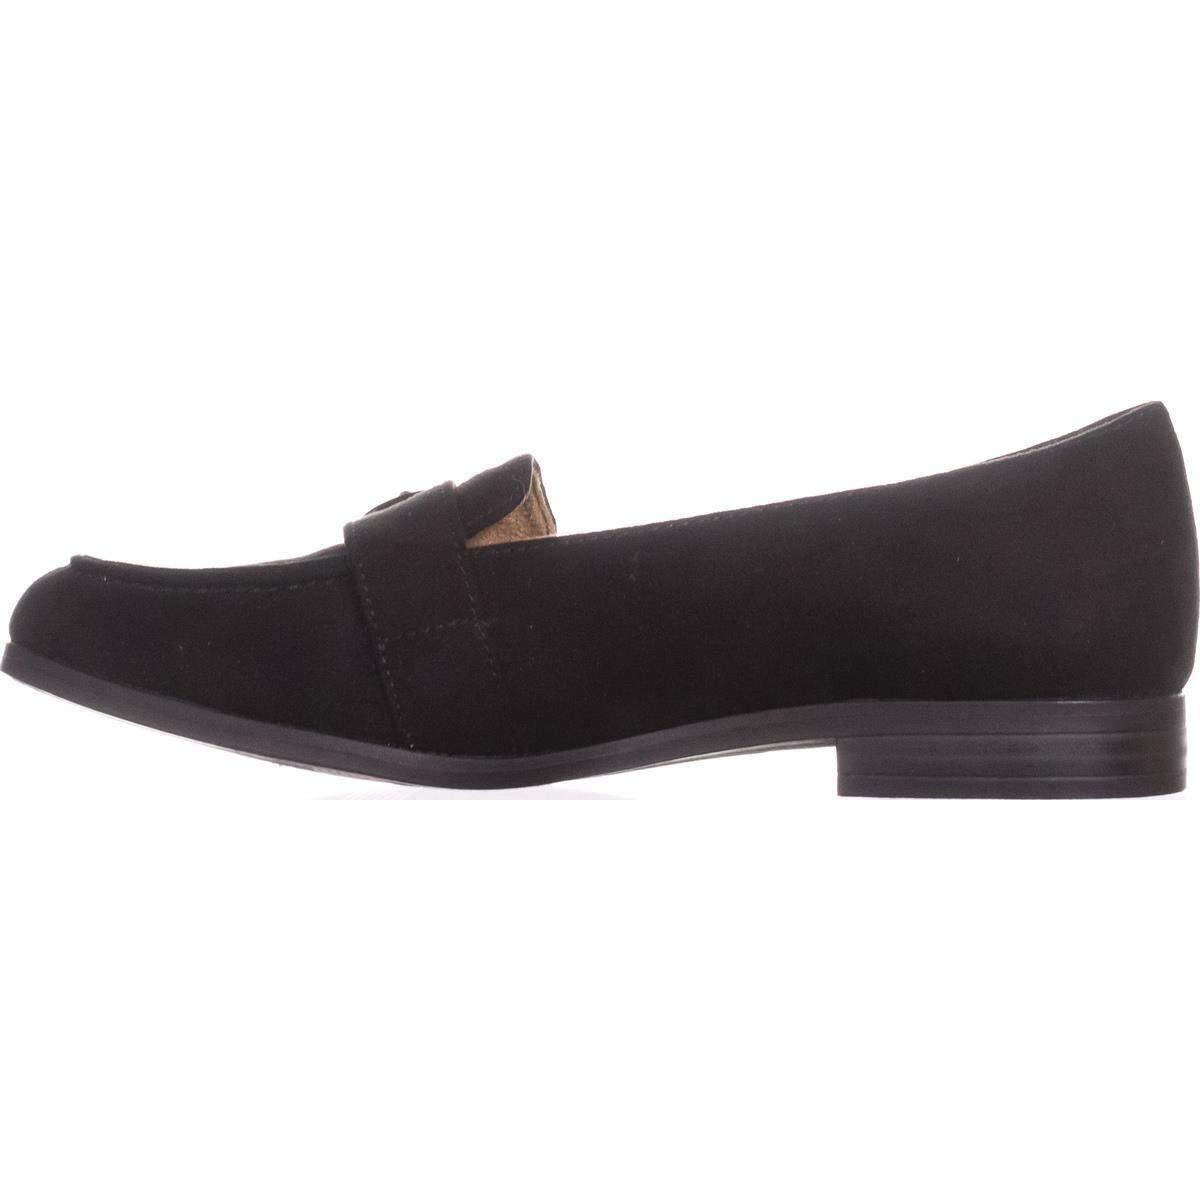 cfb82206fe7 Naturalizer Womens Mina Closed Toe Casual Slide Sandals